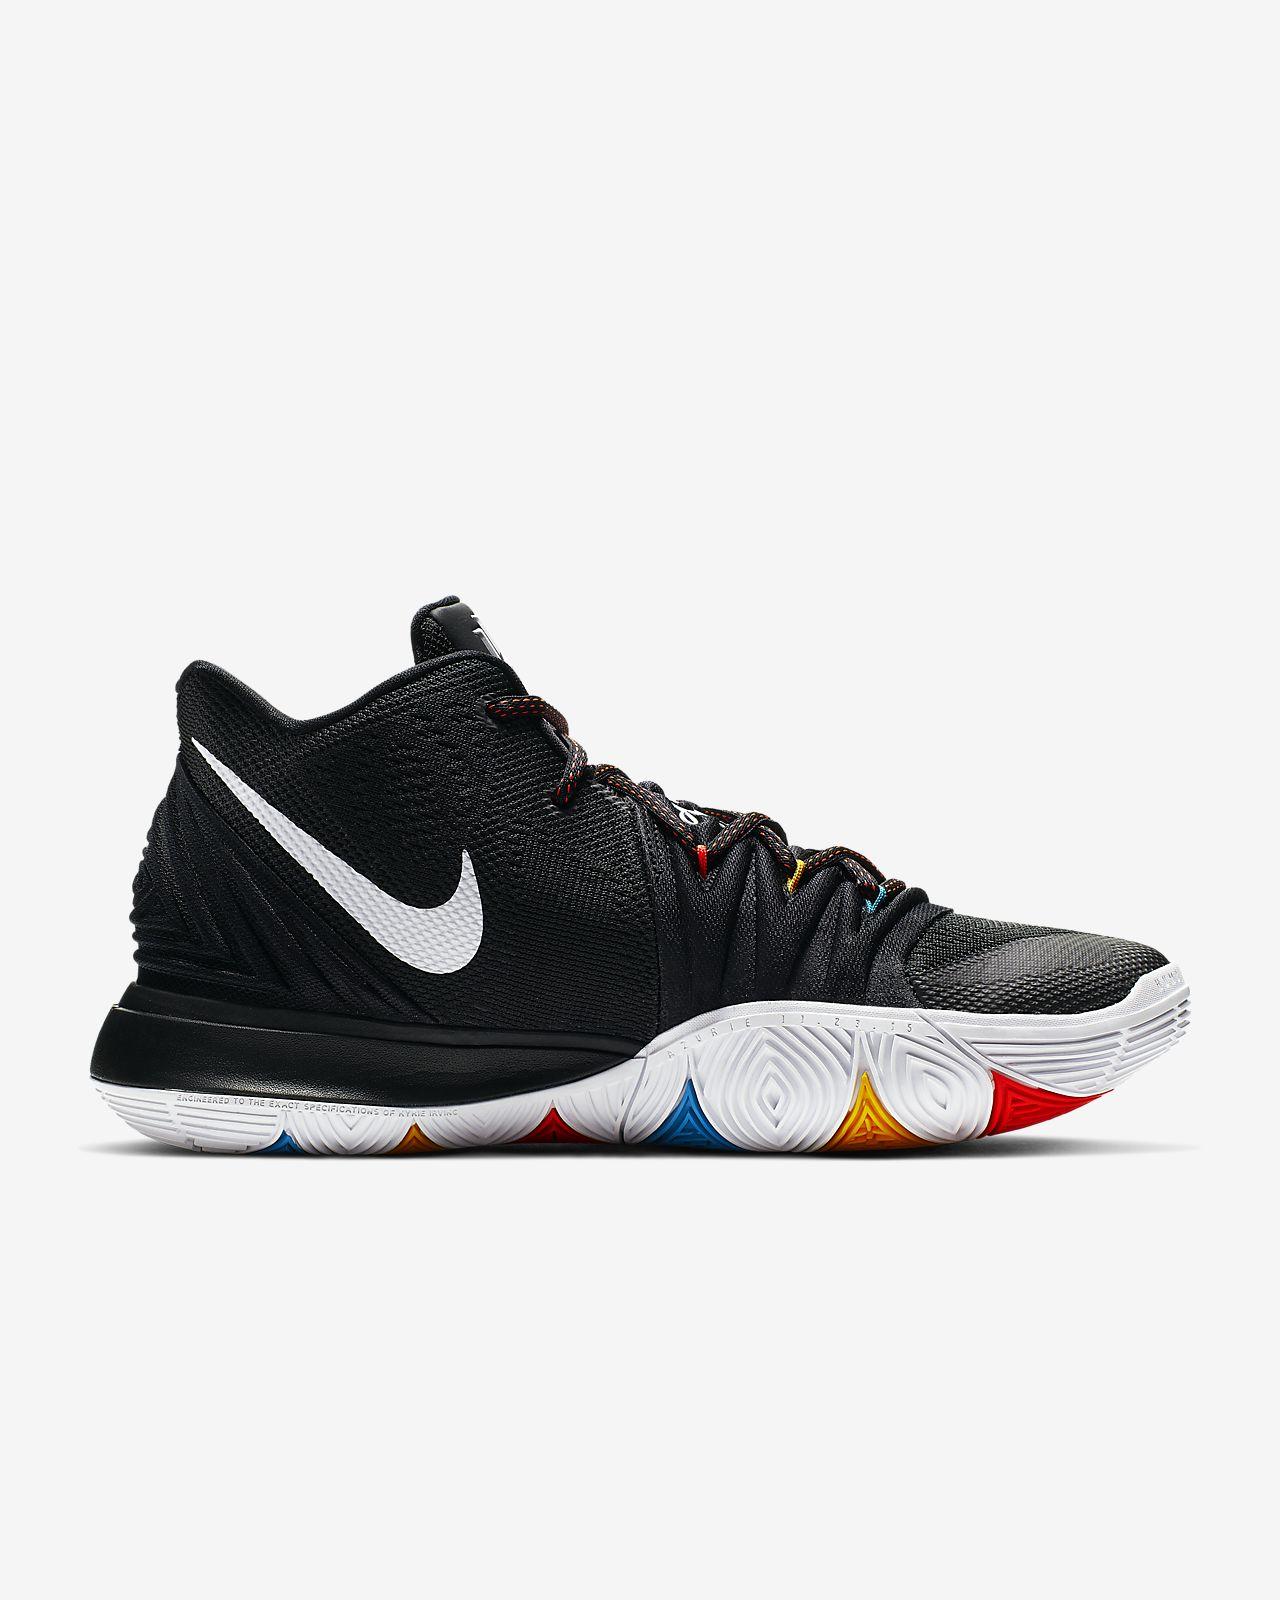 15ded20006900 Chaussure de basketball Kyrie 5 x Friends. Nike.com BE